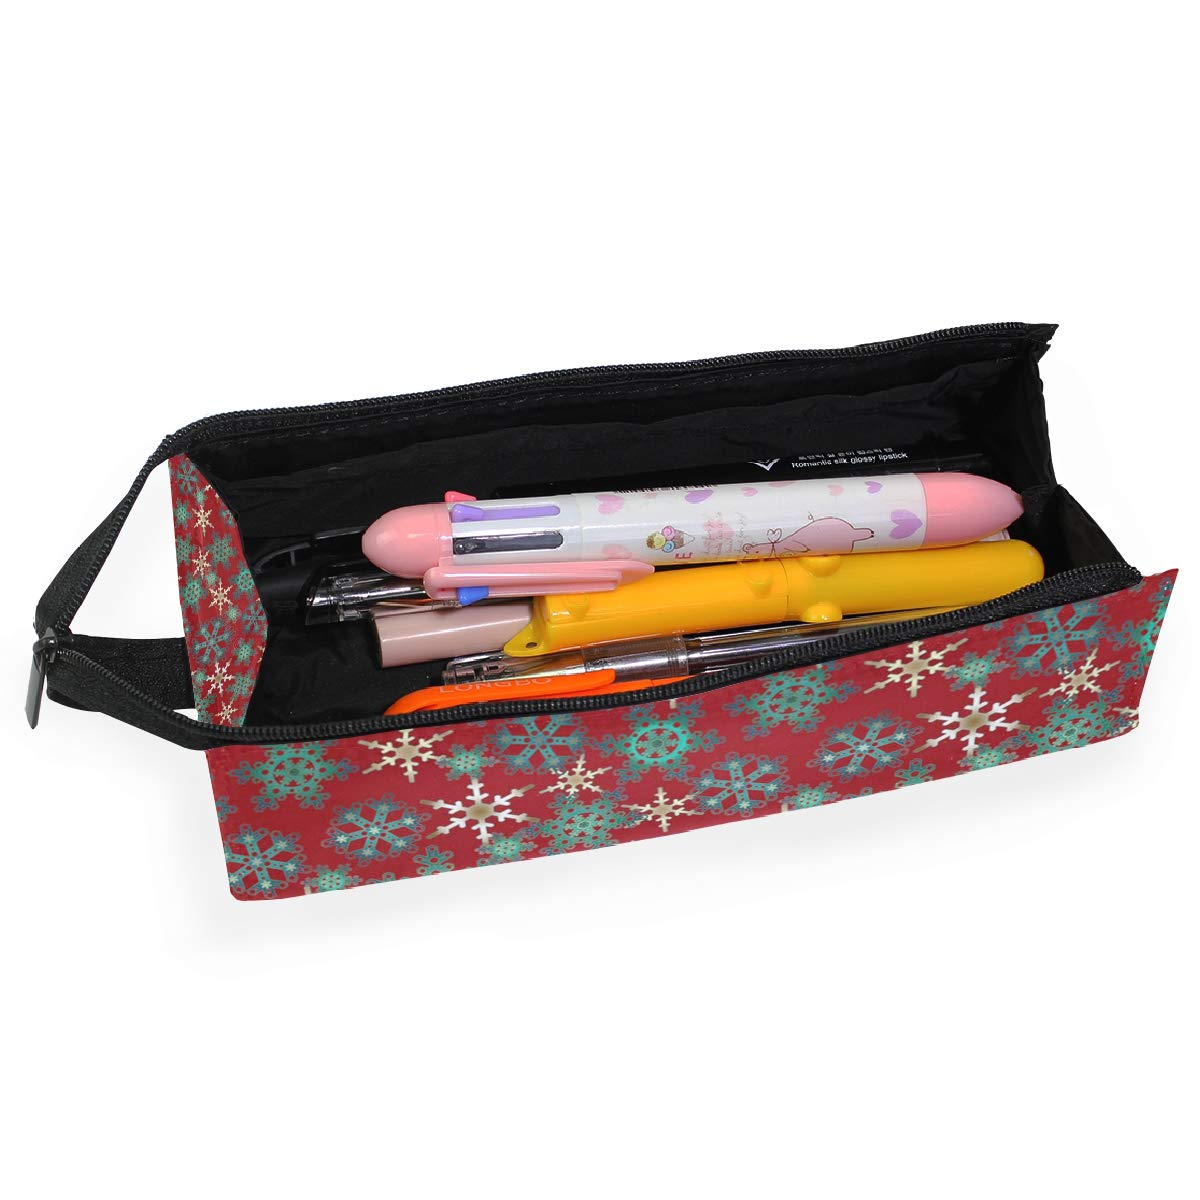 Starry Night Milky Way Long Exposure Rock Glasses Case Portable Soft Sunglasses Pen Bag Protective Box